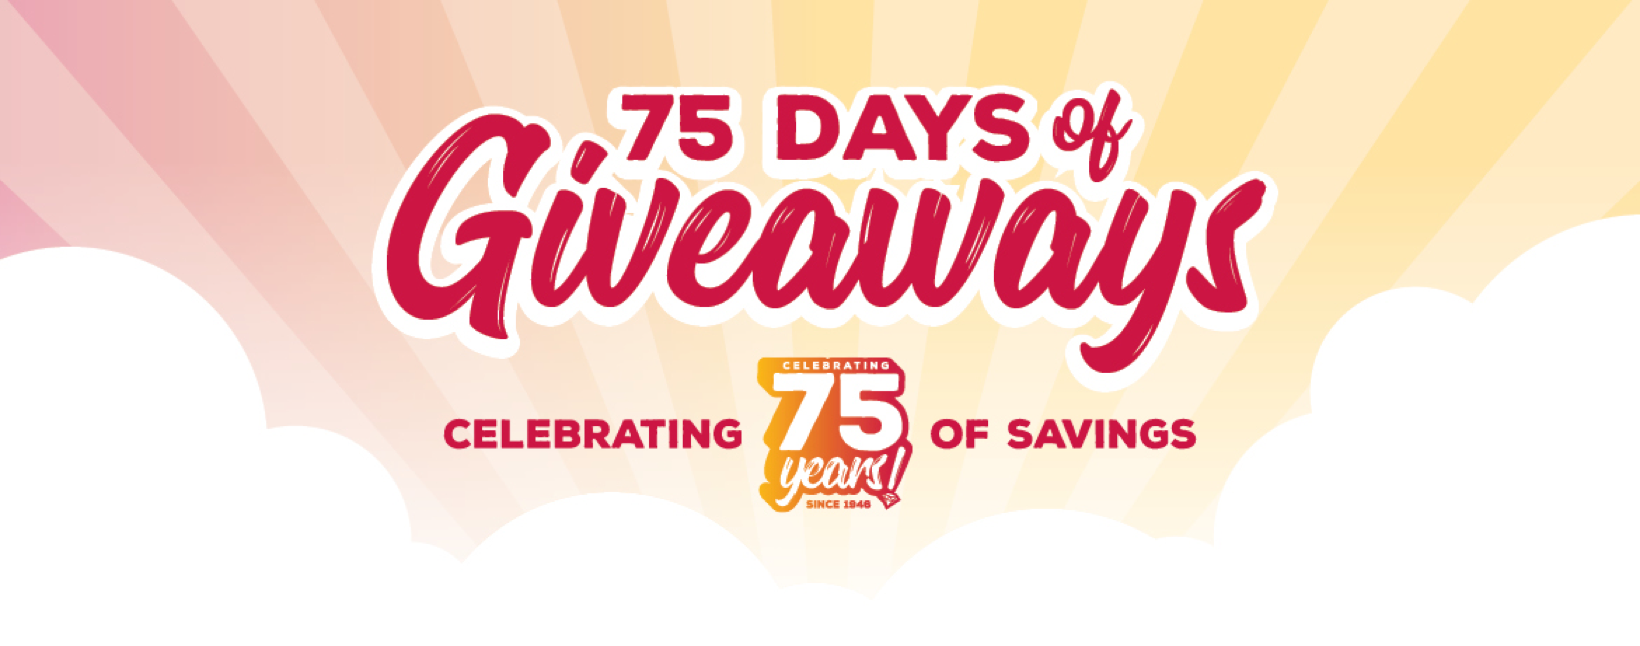 Celebrating 75 years of savings!